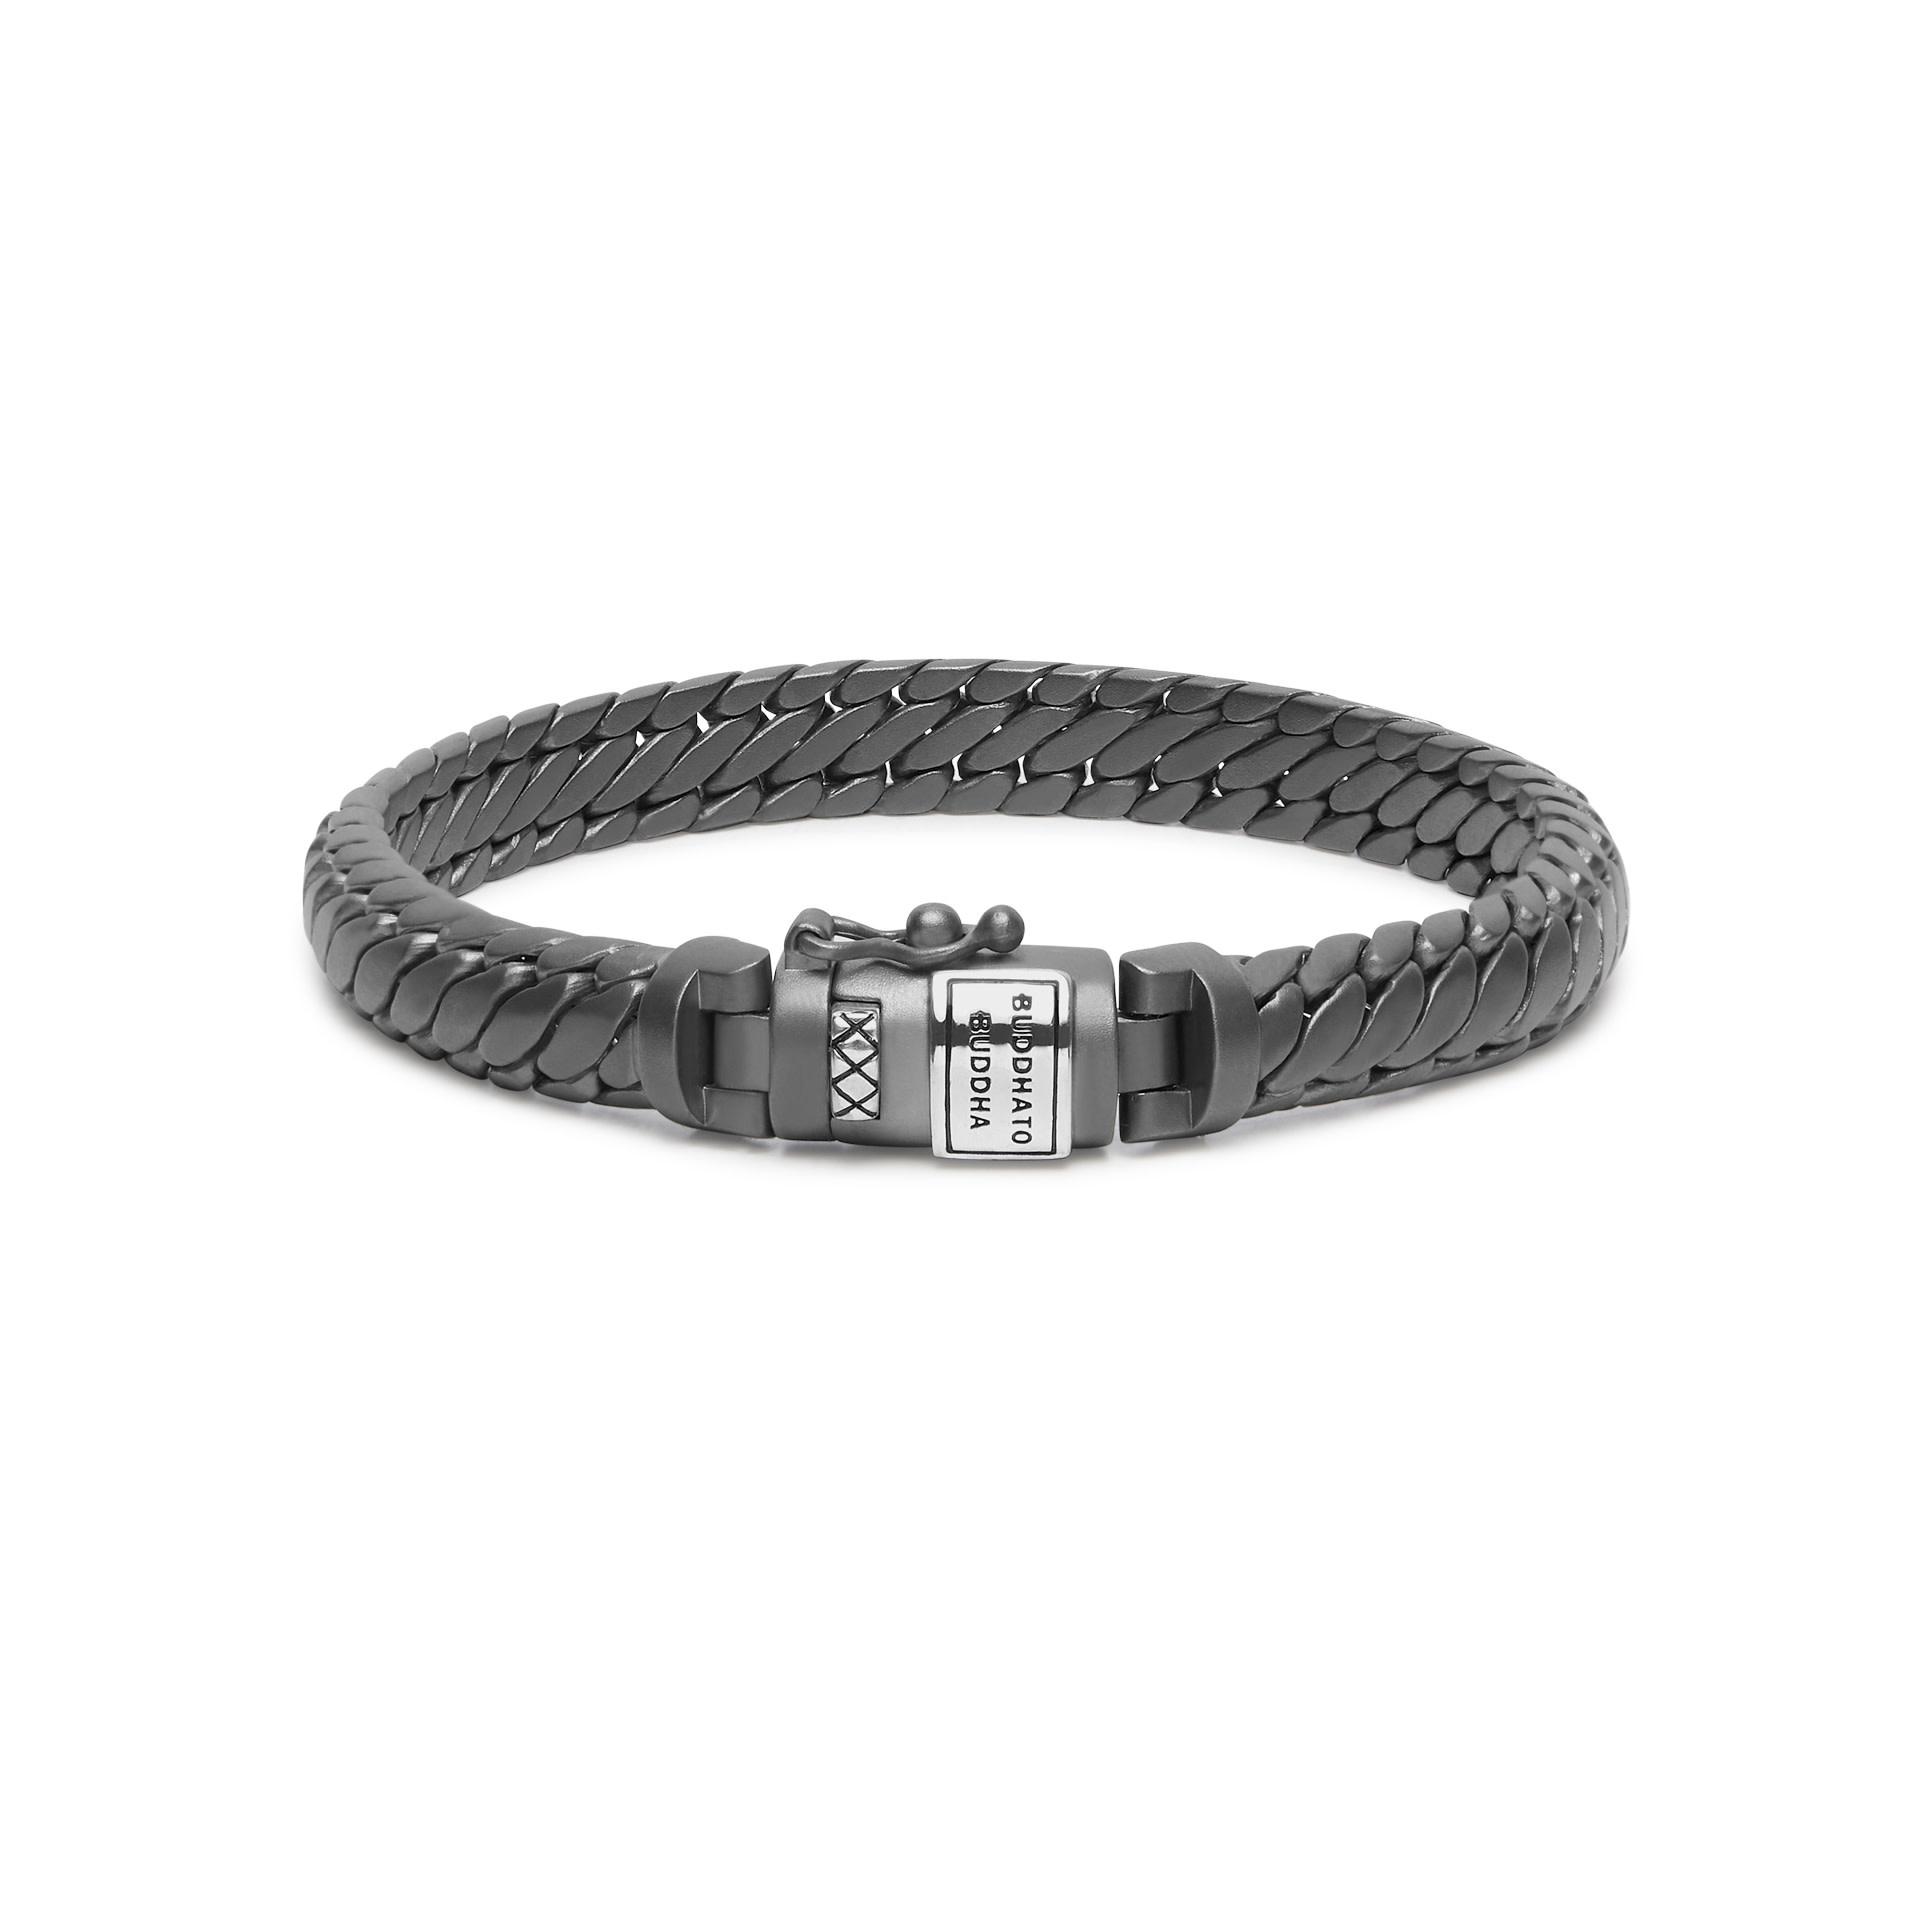 Bracelet Ben XS Black Rhodium Silver-5